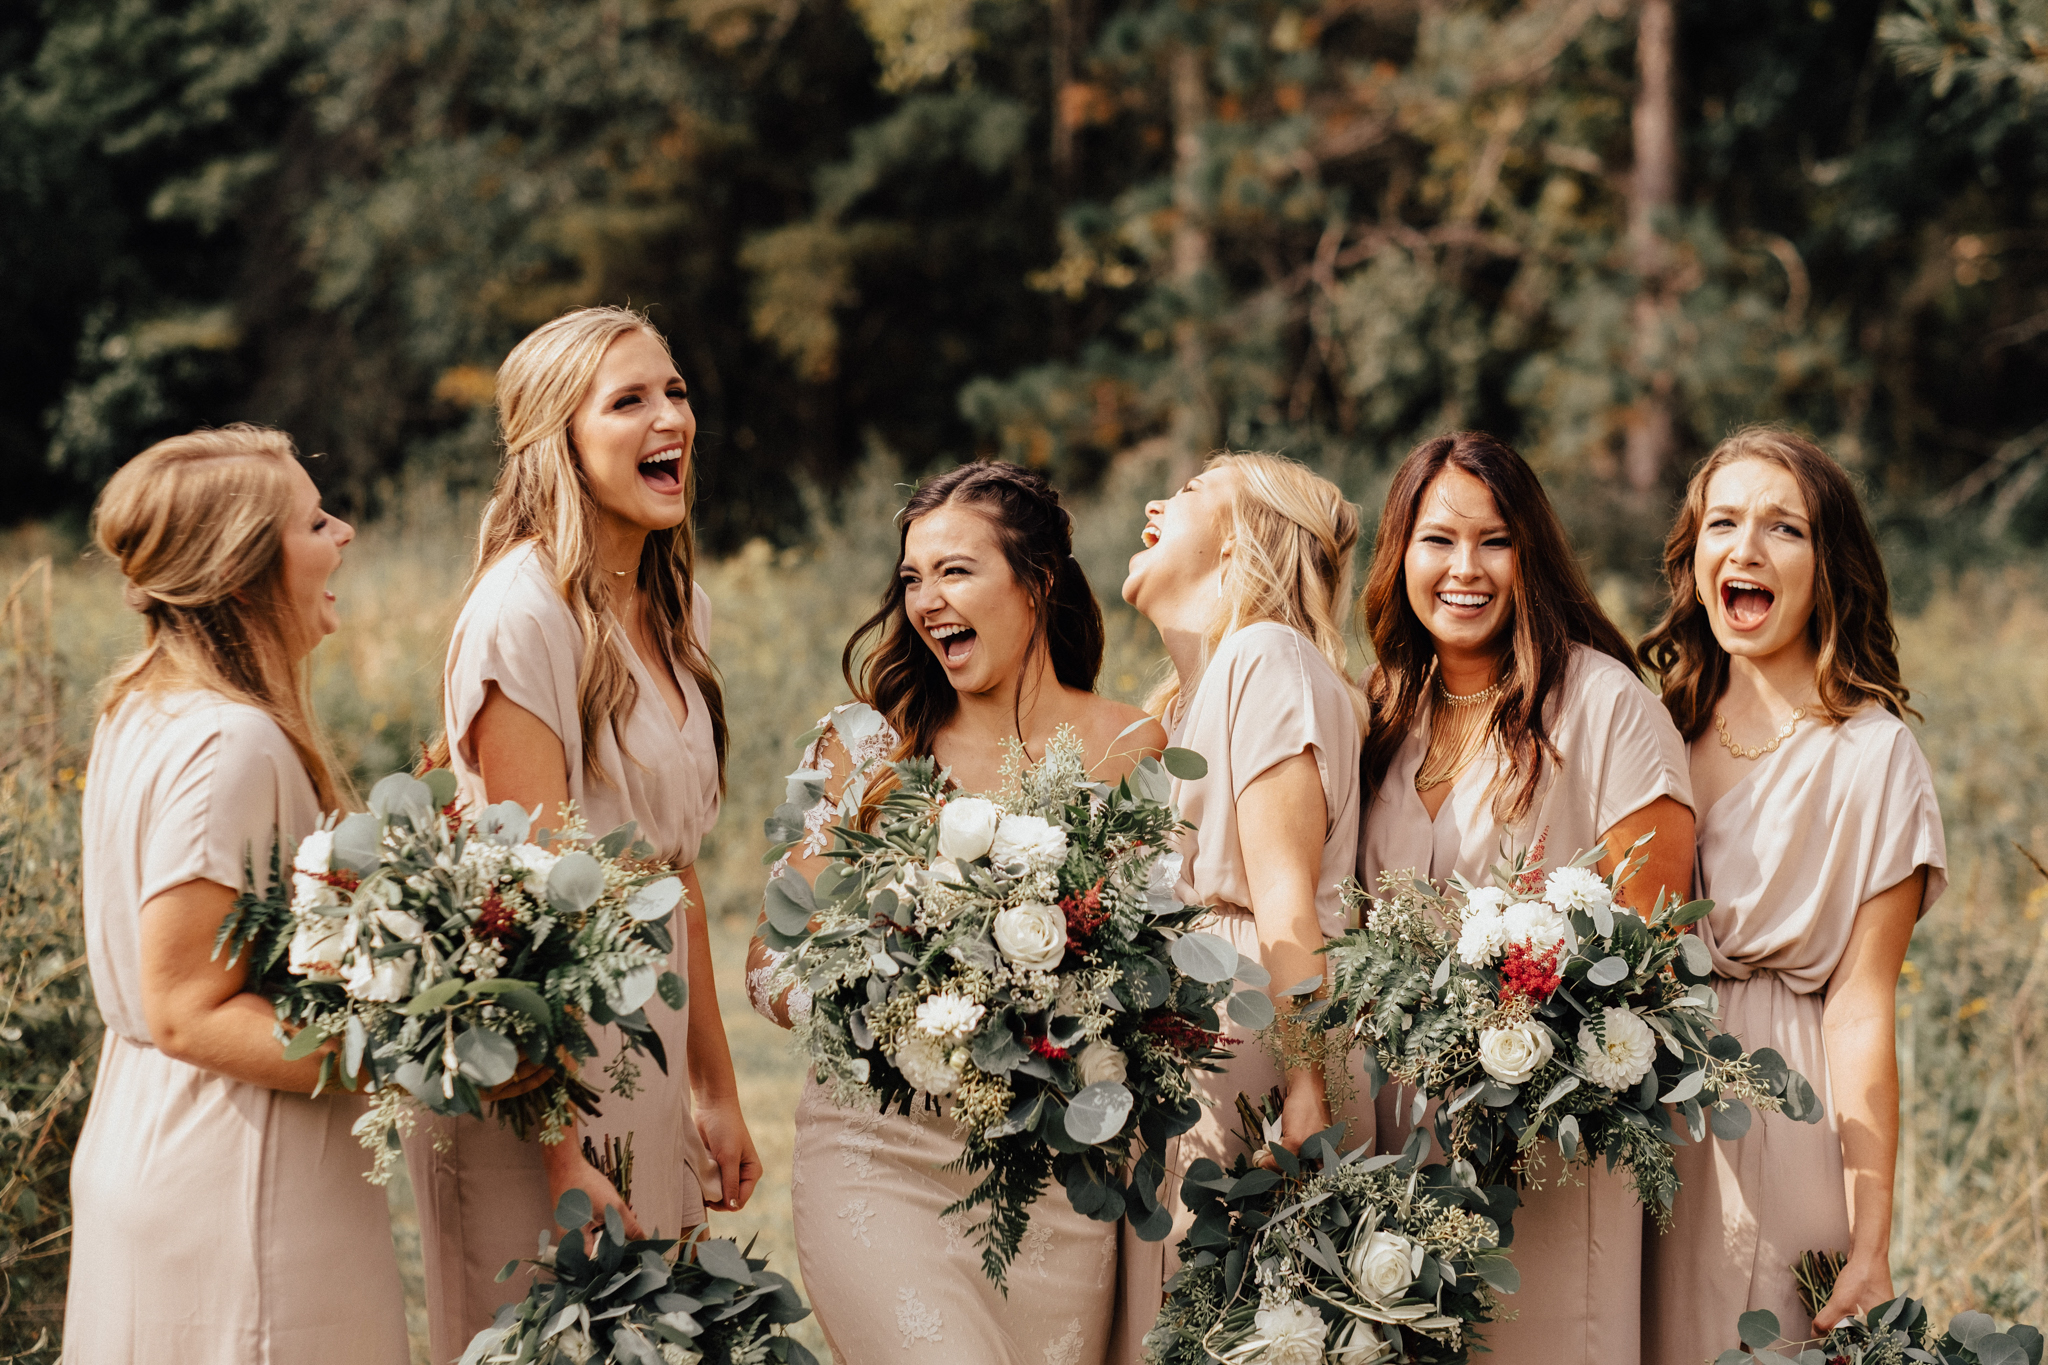 Arizona-Adventure-Elopement-Wedding-Photographer-102.jpg